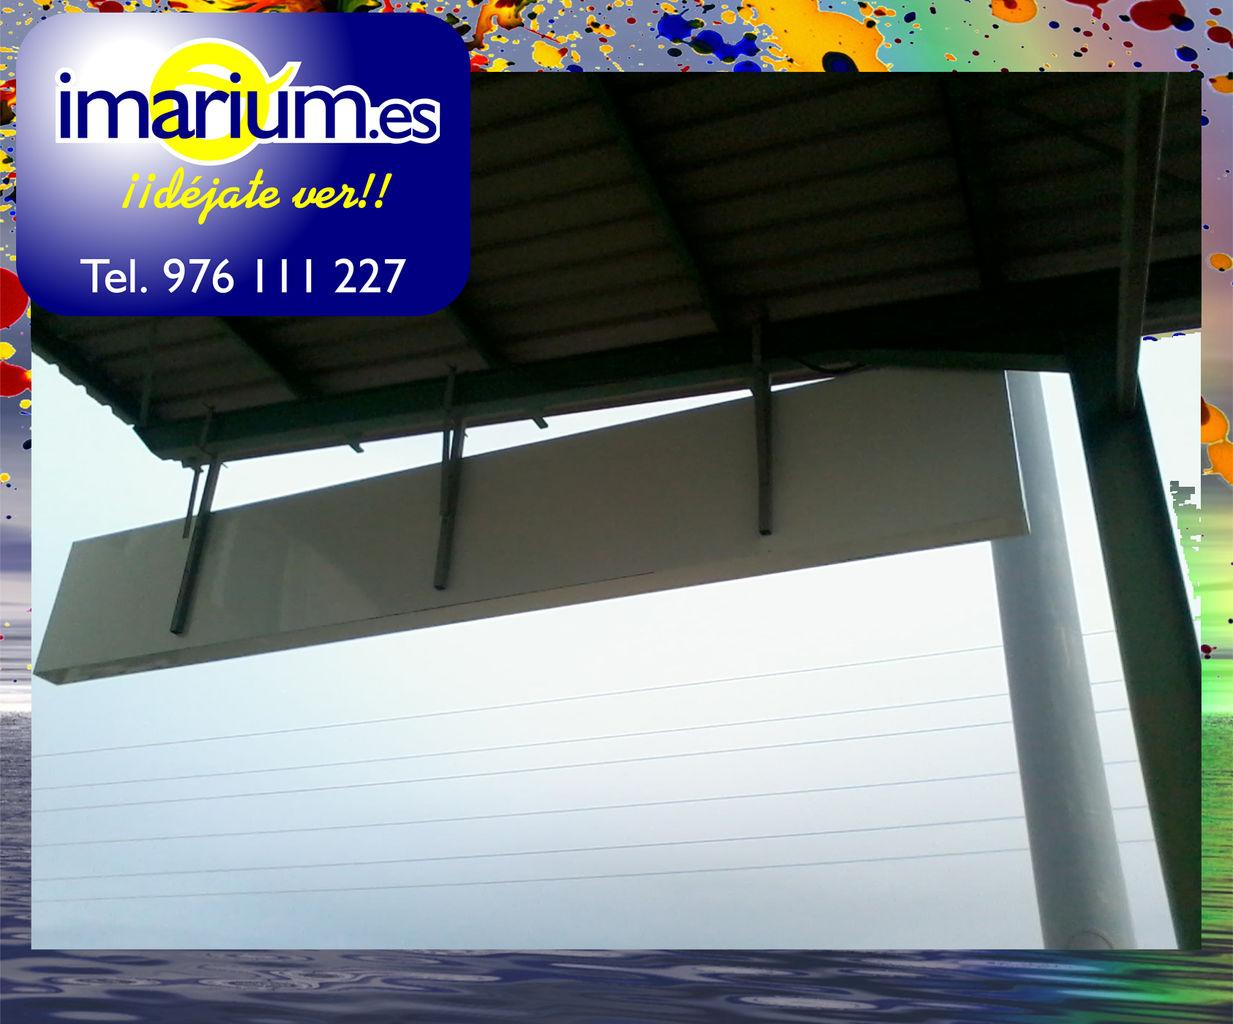 ROTULOS Luminosos ZARAGOZA | Rotulos imarium.es Zaragoza | Rotulos ...